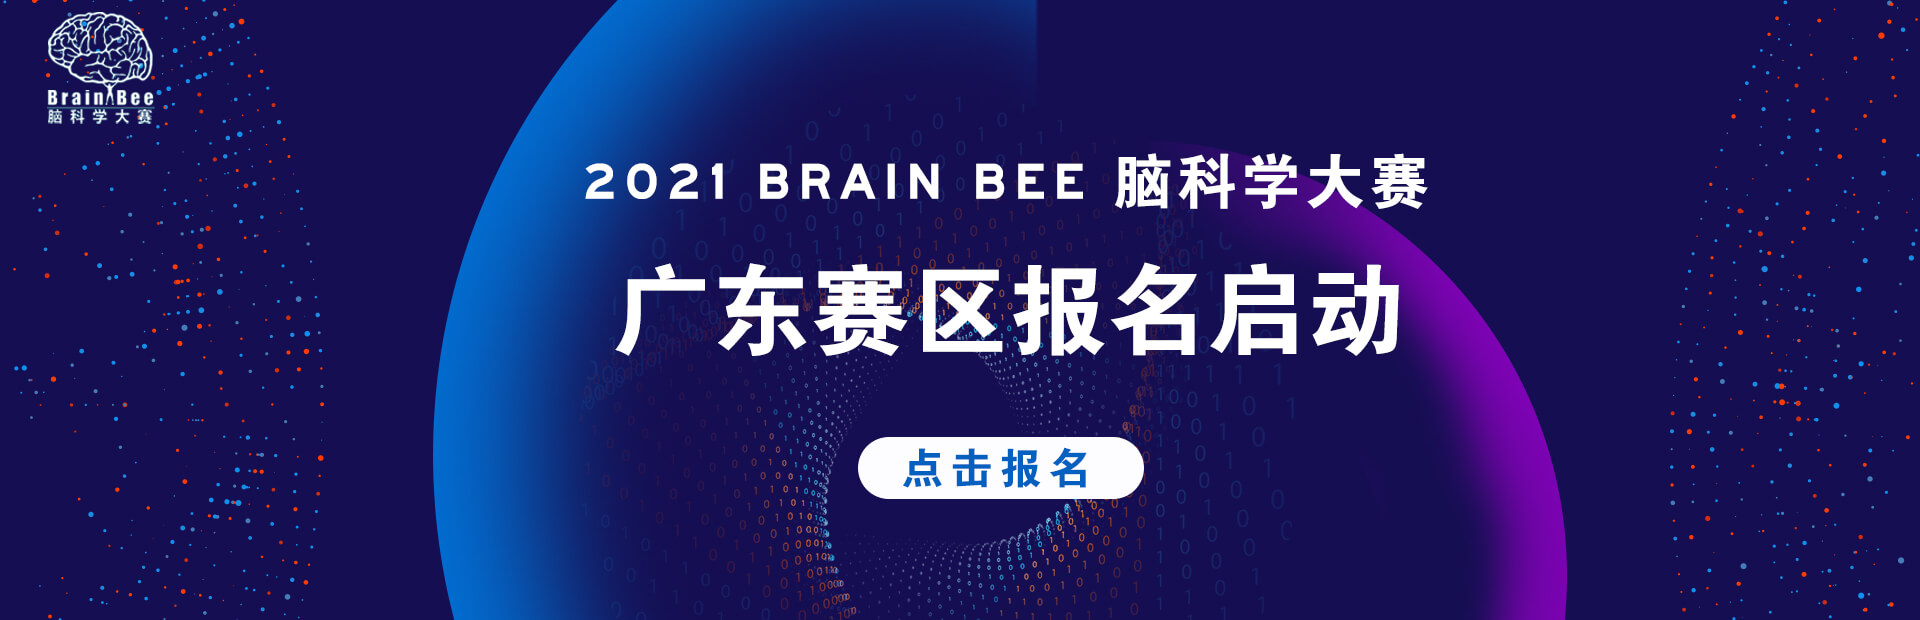 2021BrainBee